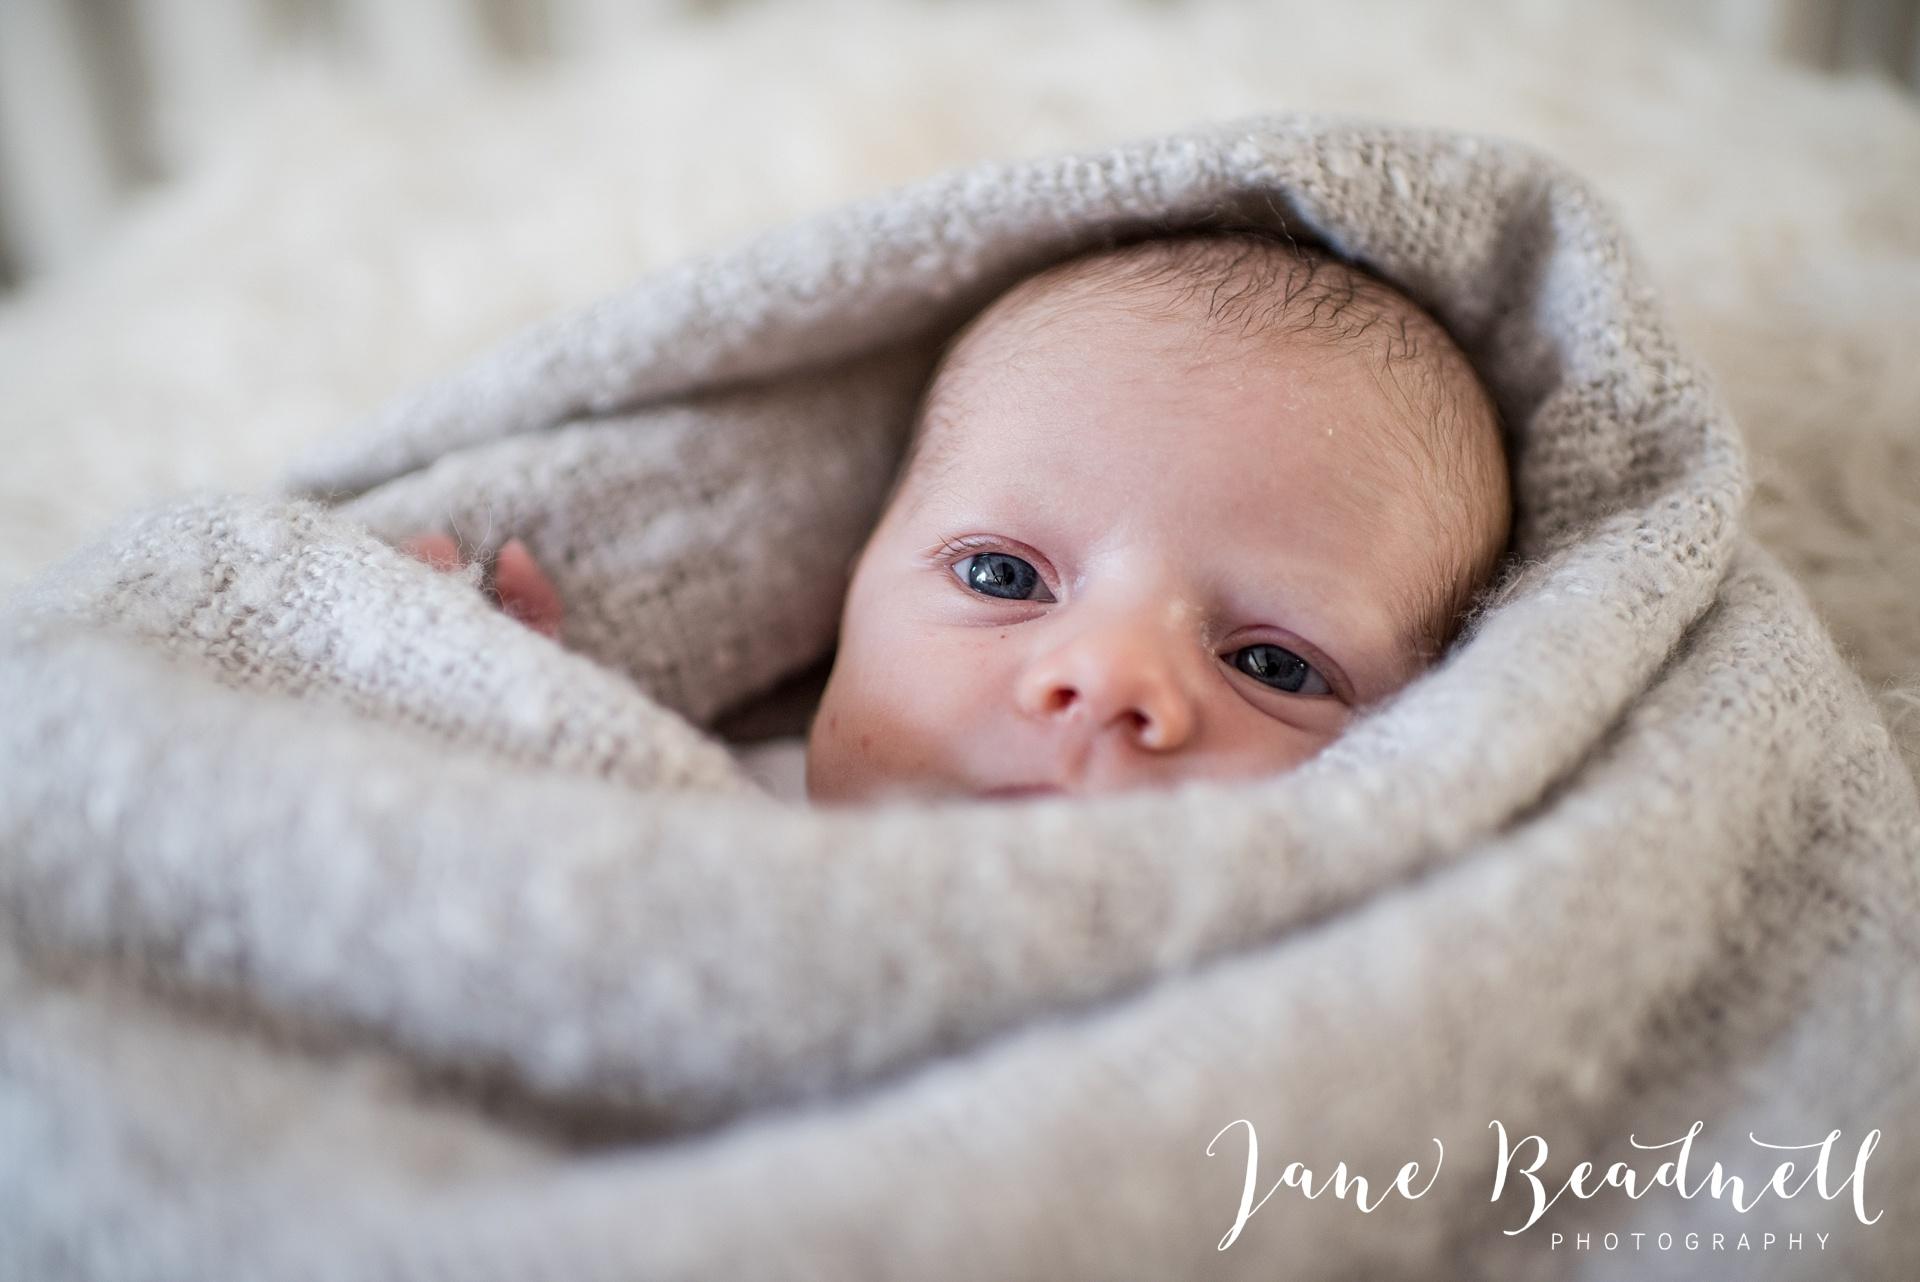 Otley family portrait photographer Jane Beadnell Photography